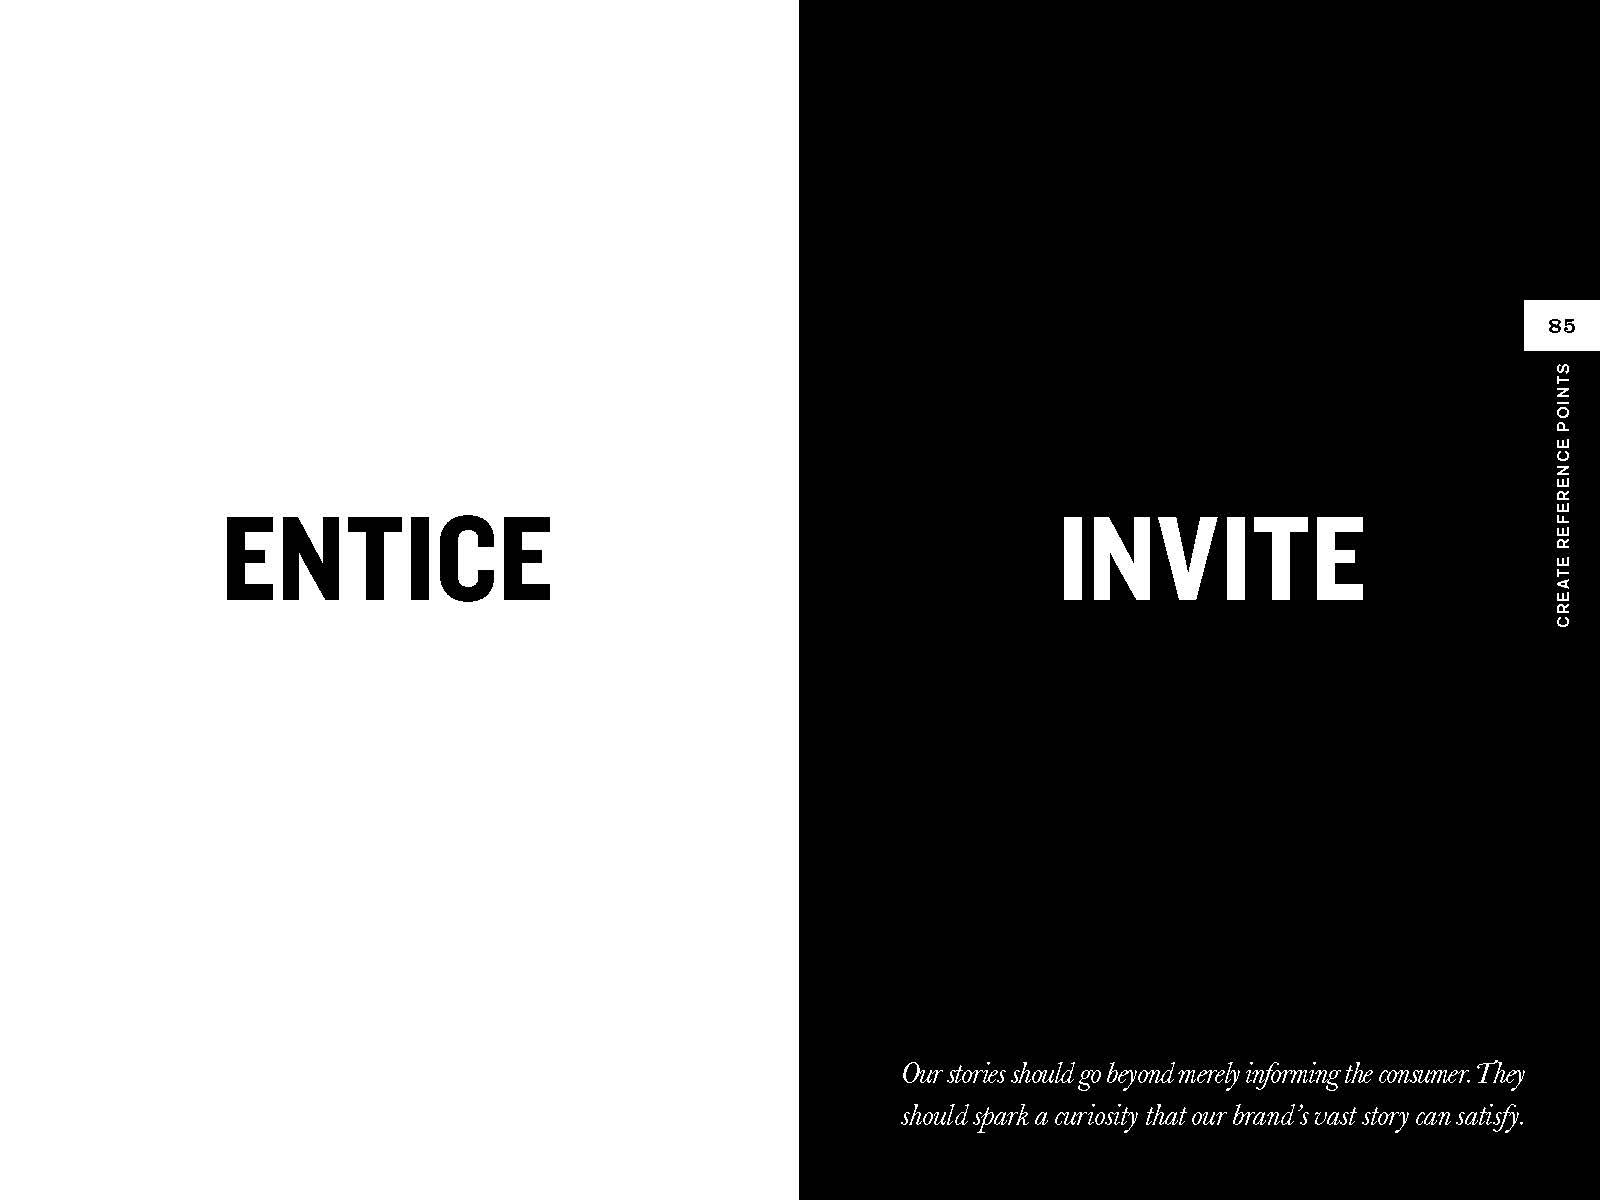 Jack Daniel's Guiding Principles 2012_Page_46.jpg